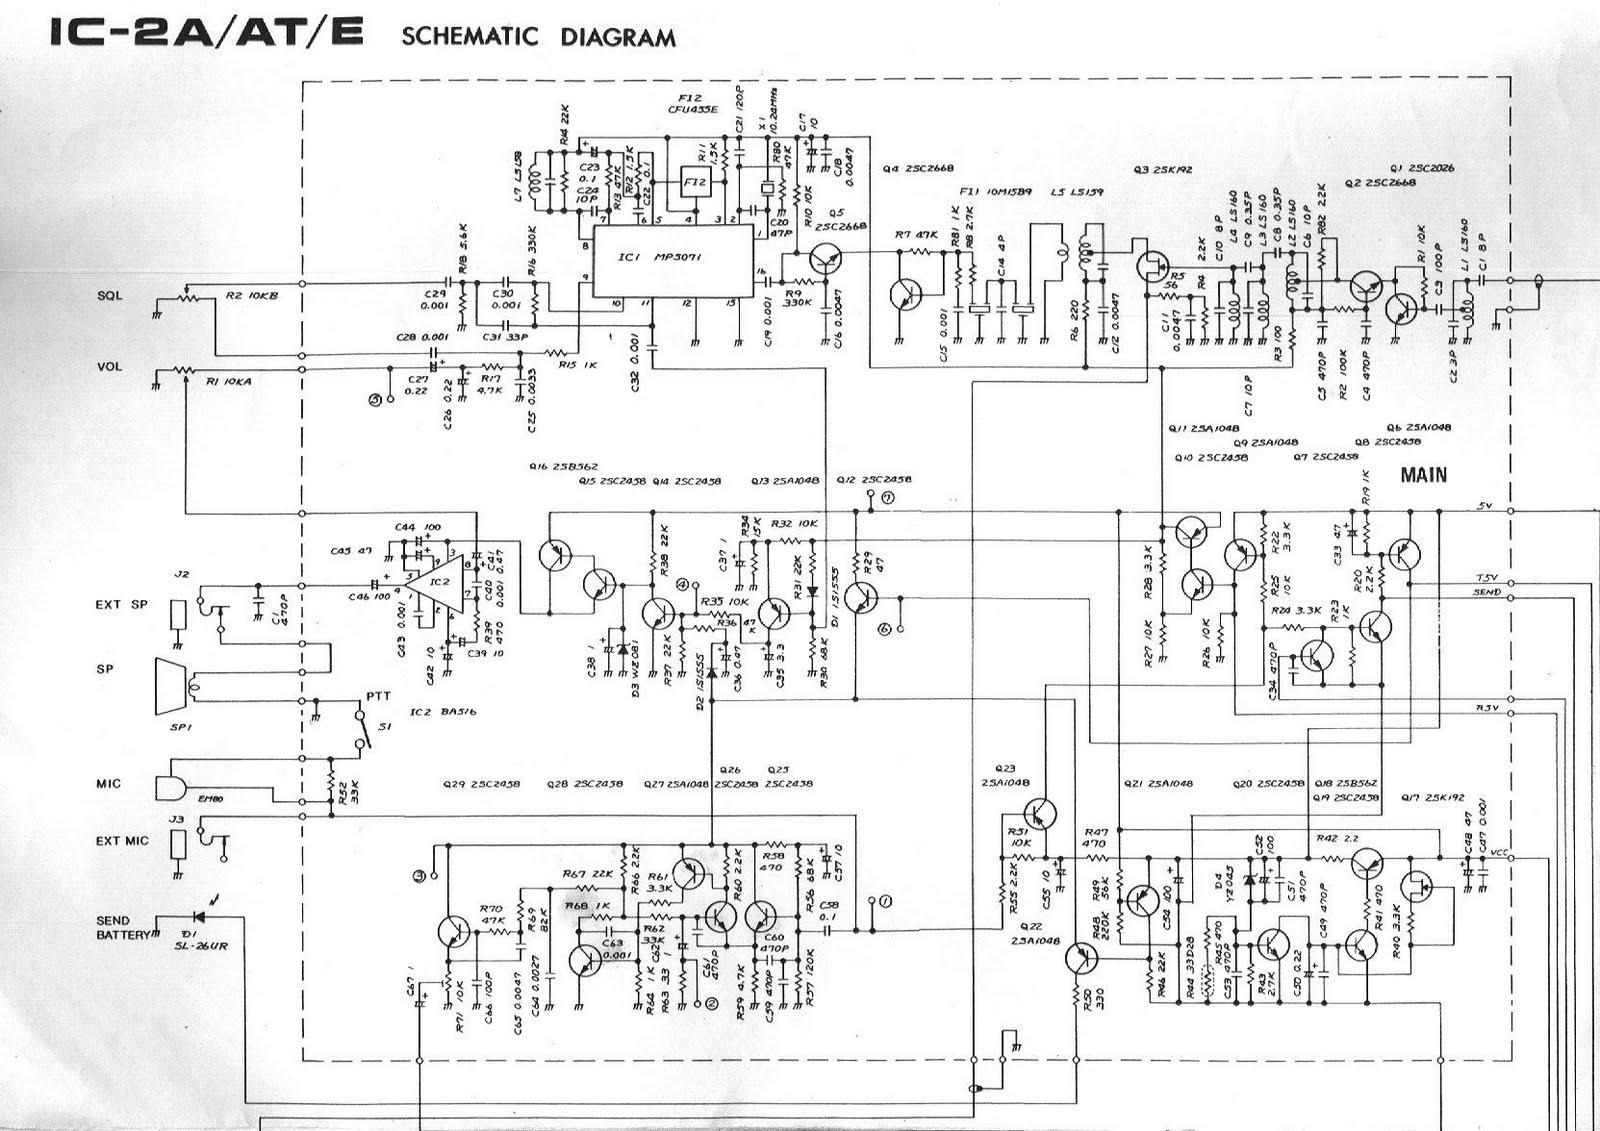 Icom Sm 20 Schematic Auto Electrical Wiring Diagram Alinco Mic Ic2n Diy Enthusiasts Diagrams Schematics Heathkit